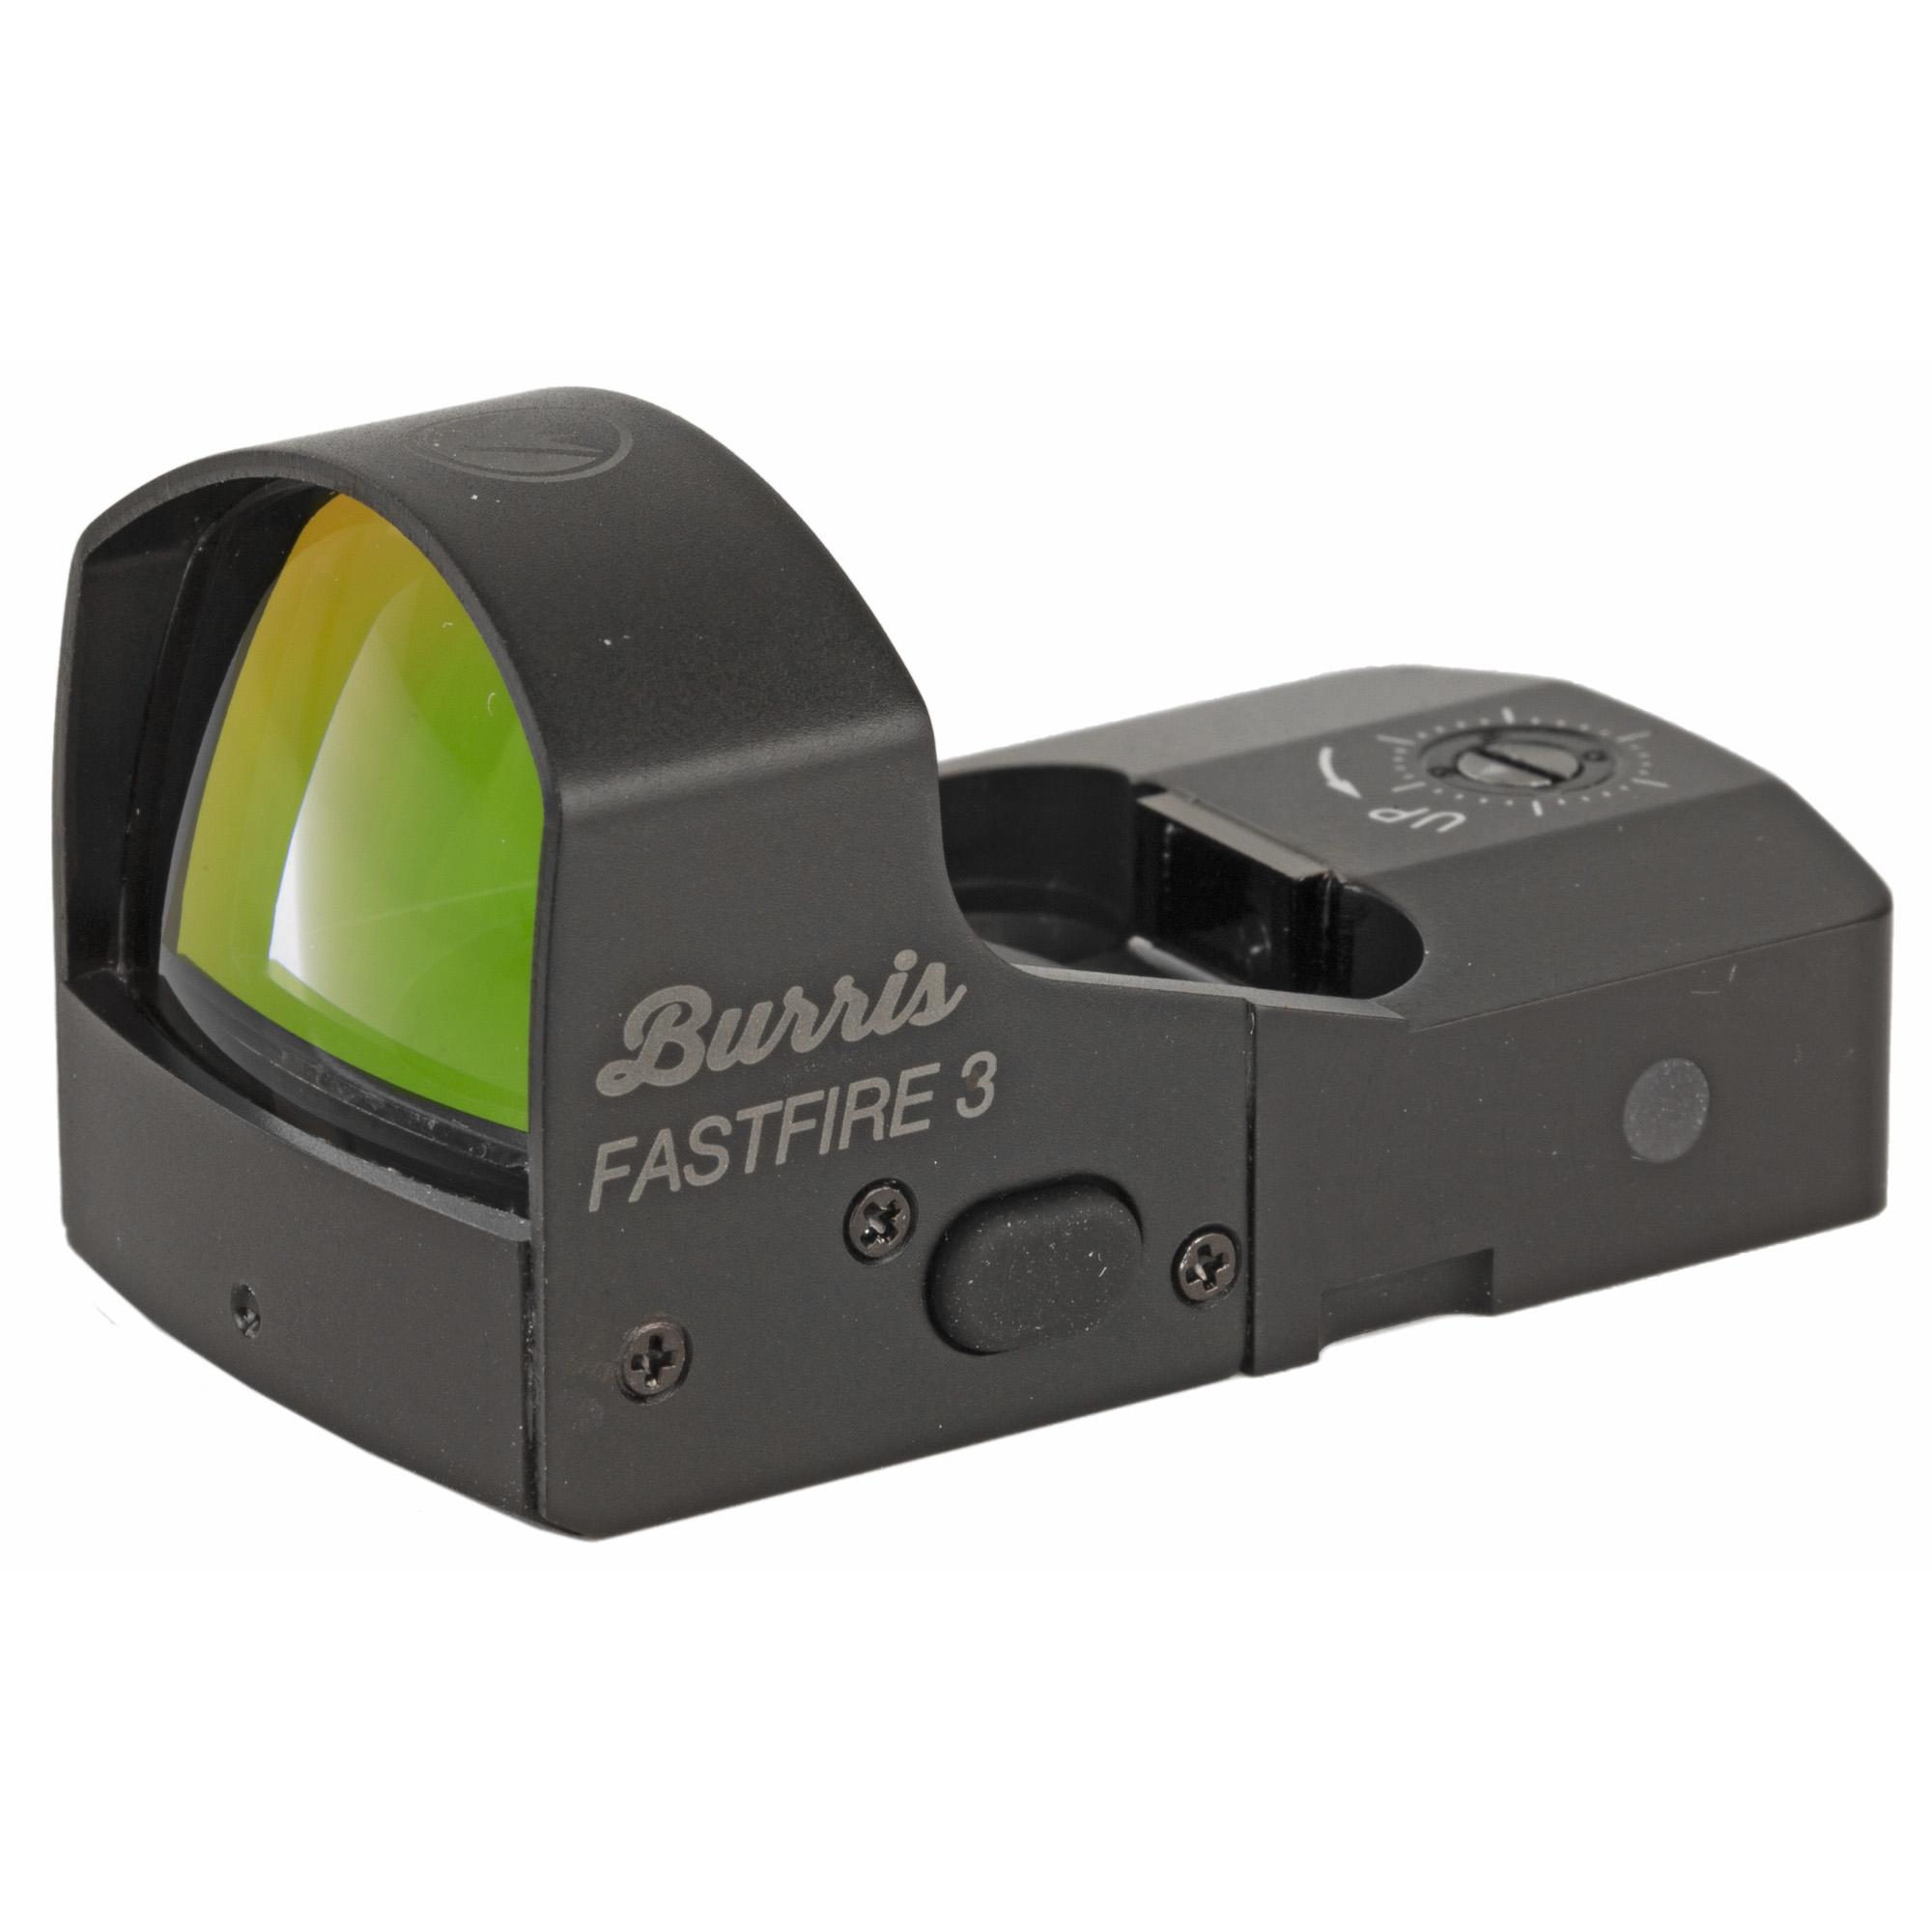 Burris Fastfire 3 3moa Matte